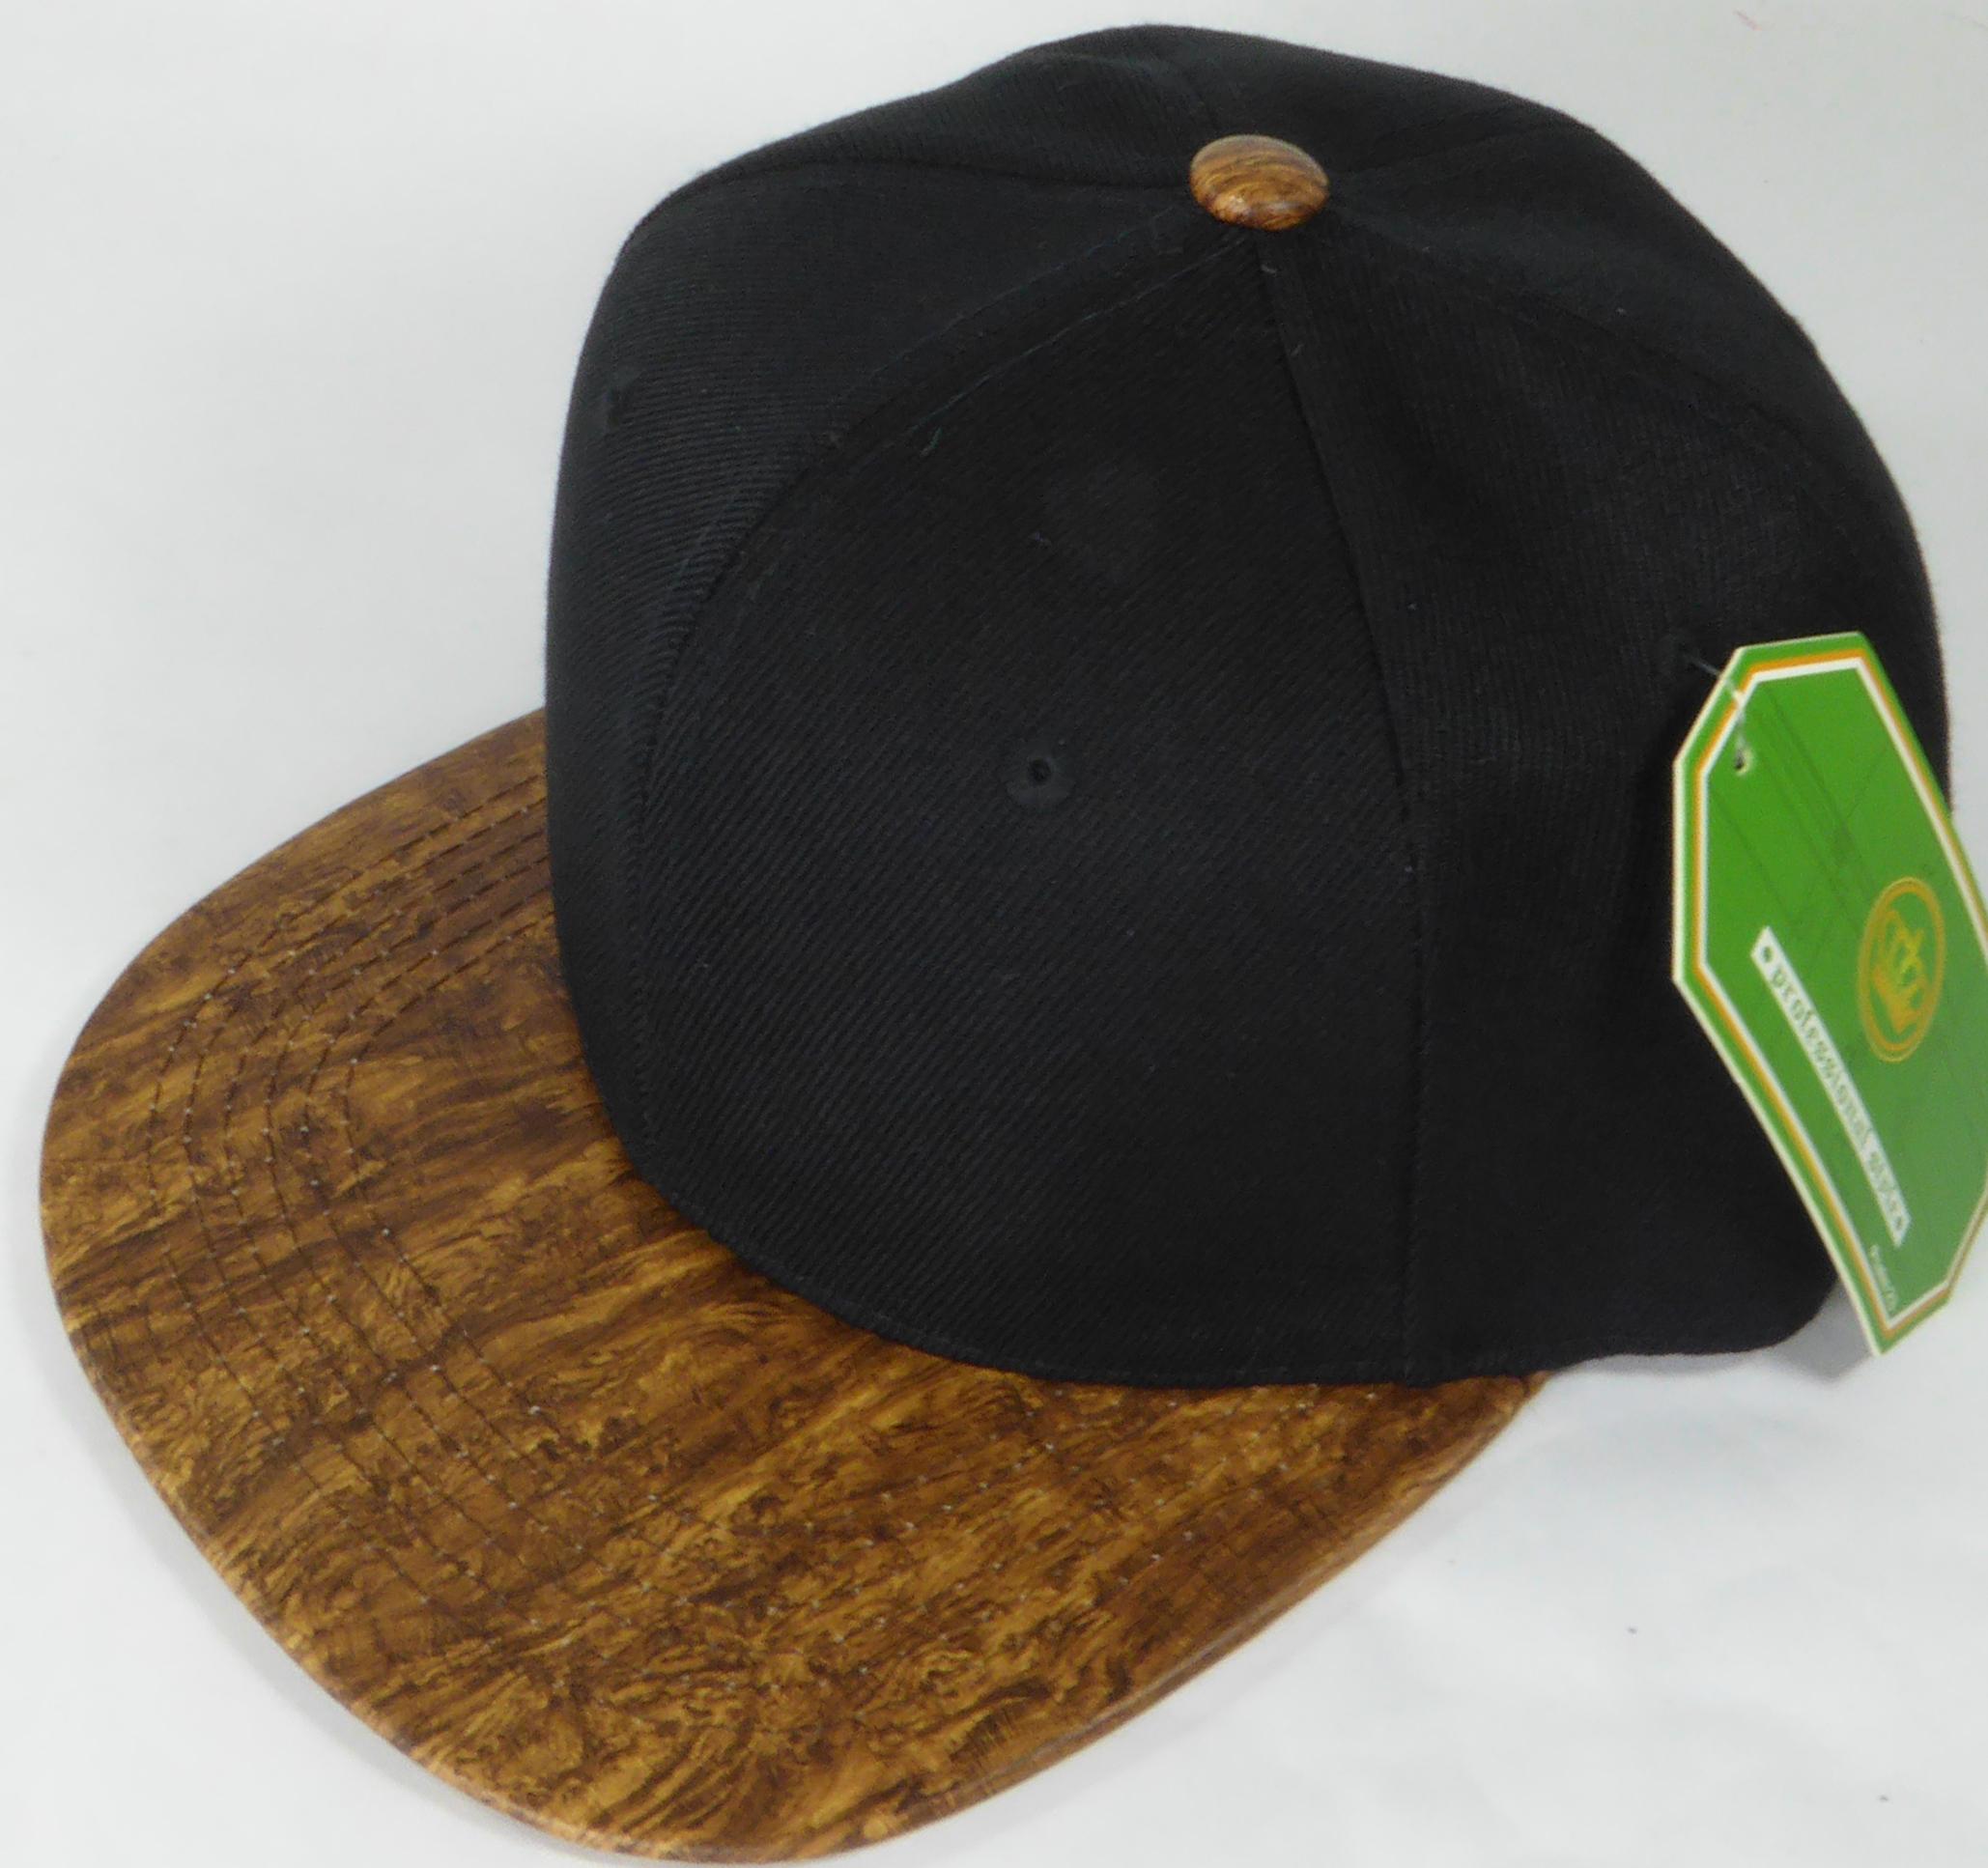 6d664cc9628 Wholesale Blank Snapback Caps - Brown Oak Woodbrim. Brown Oak Woodbrim  Snapback